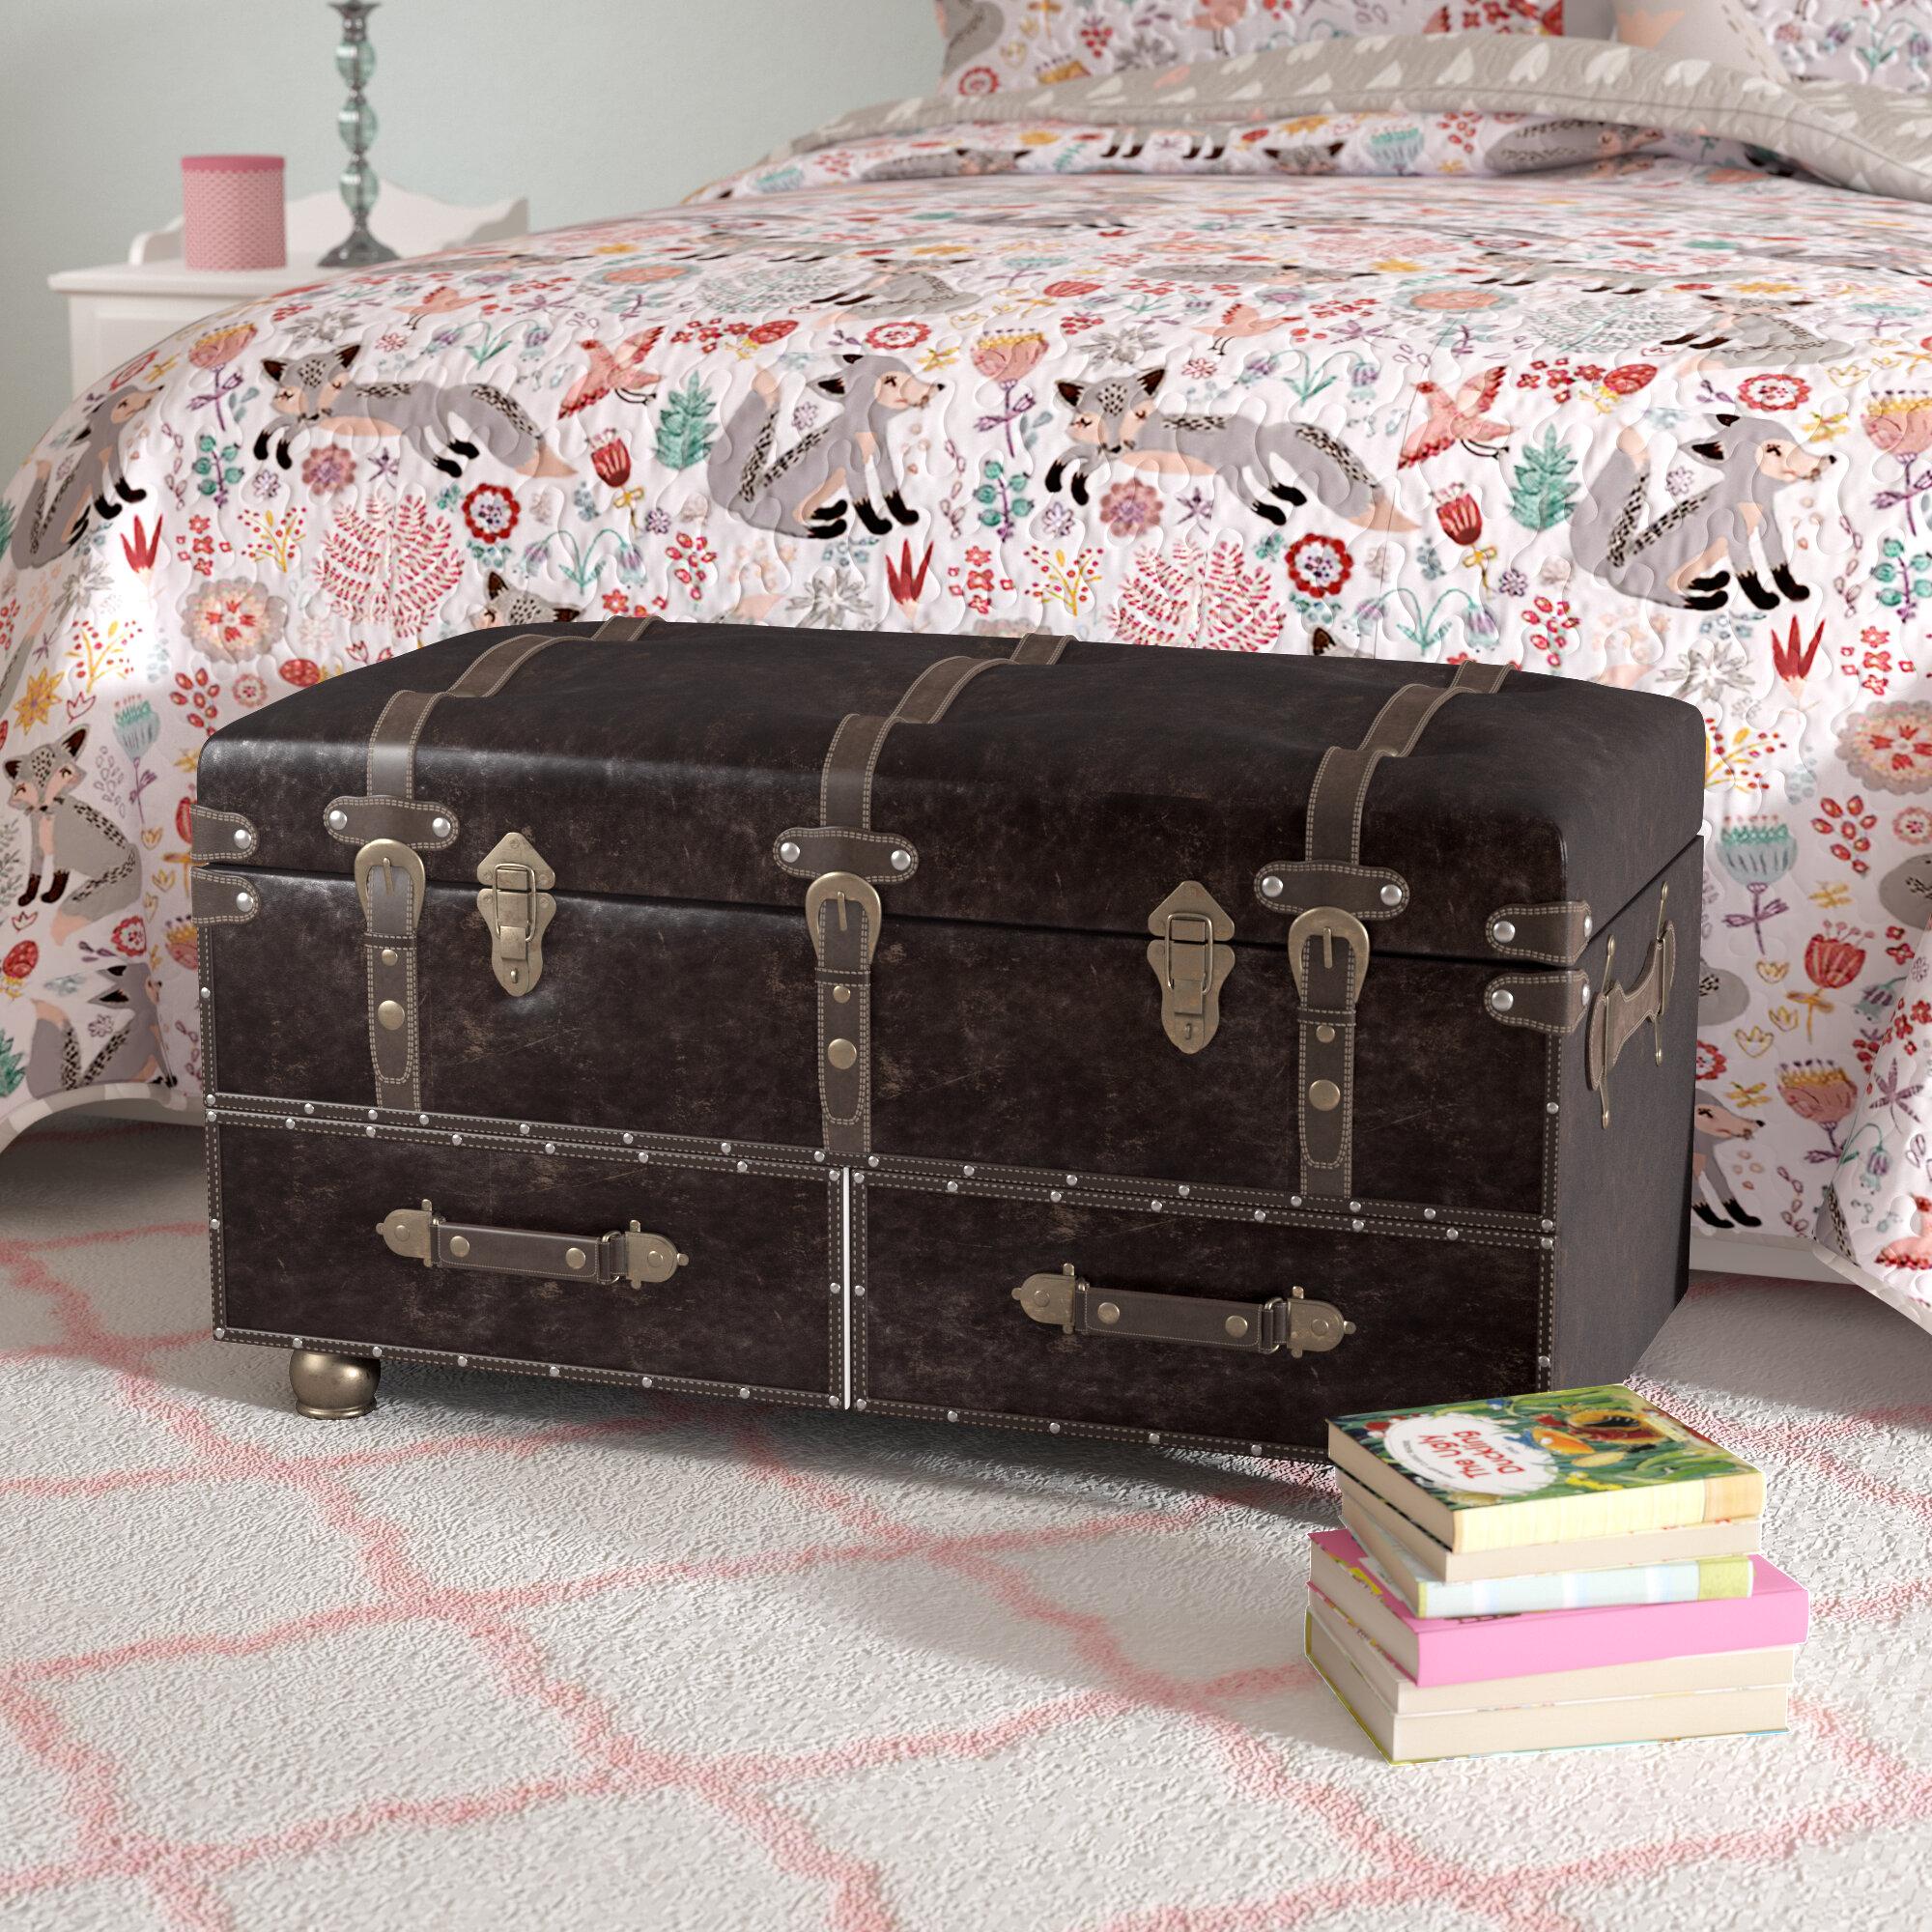 Bed Trunk | Wayfair